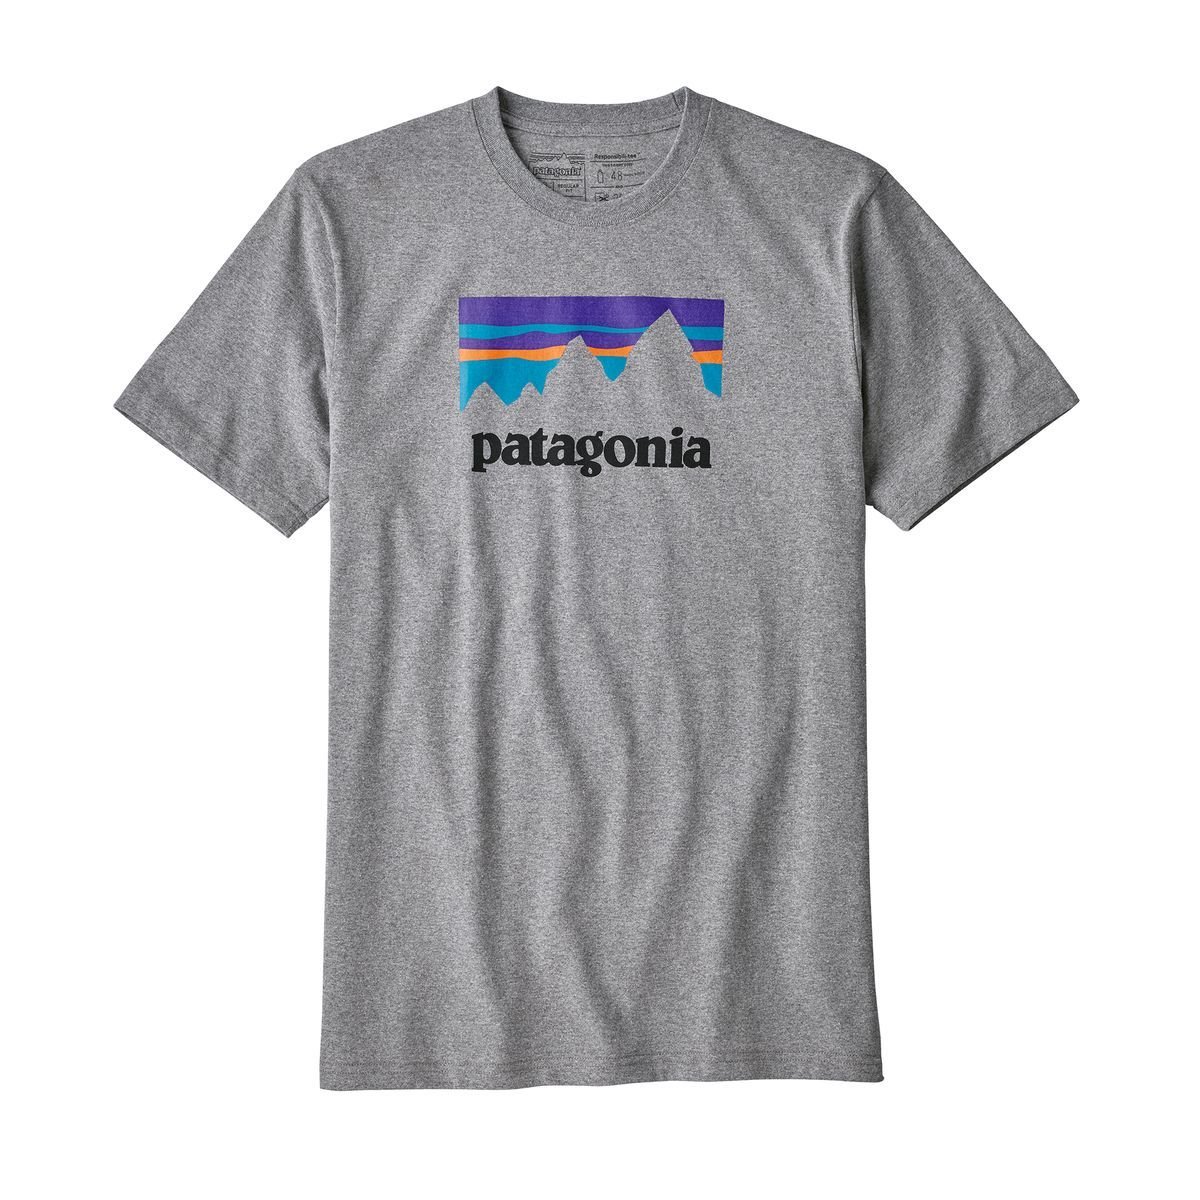 PatagoniaMens Shop Sticker Long-Sleeved Responsibili-TeeDolomite Blue